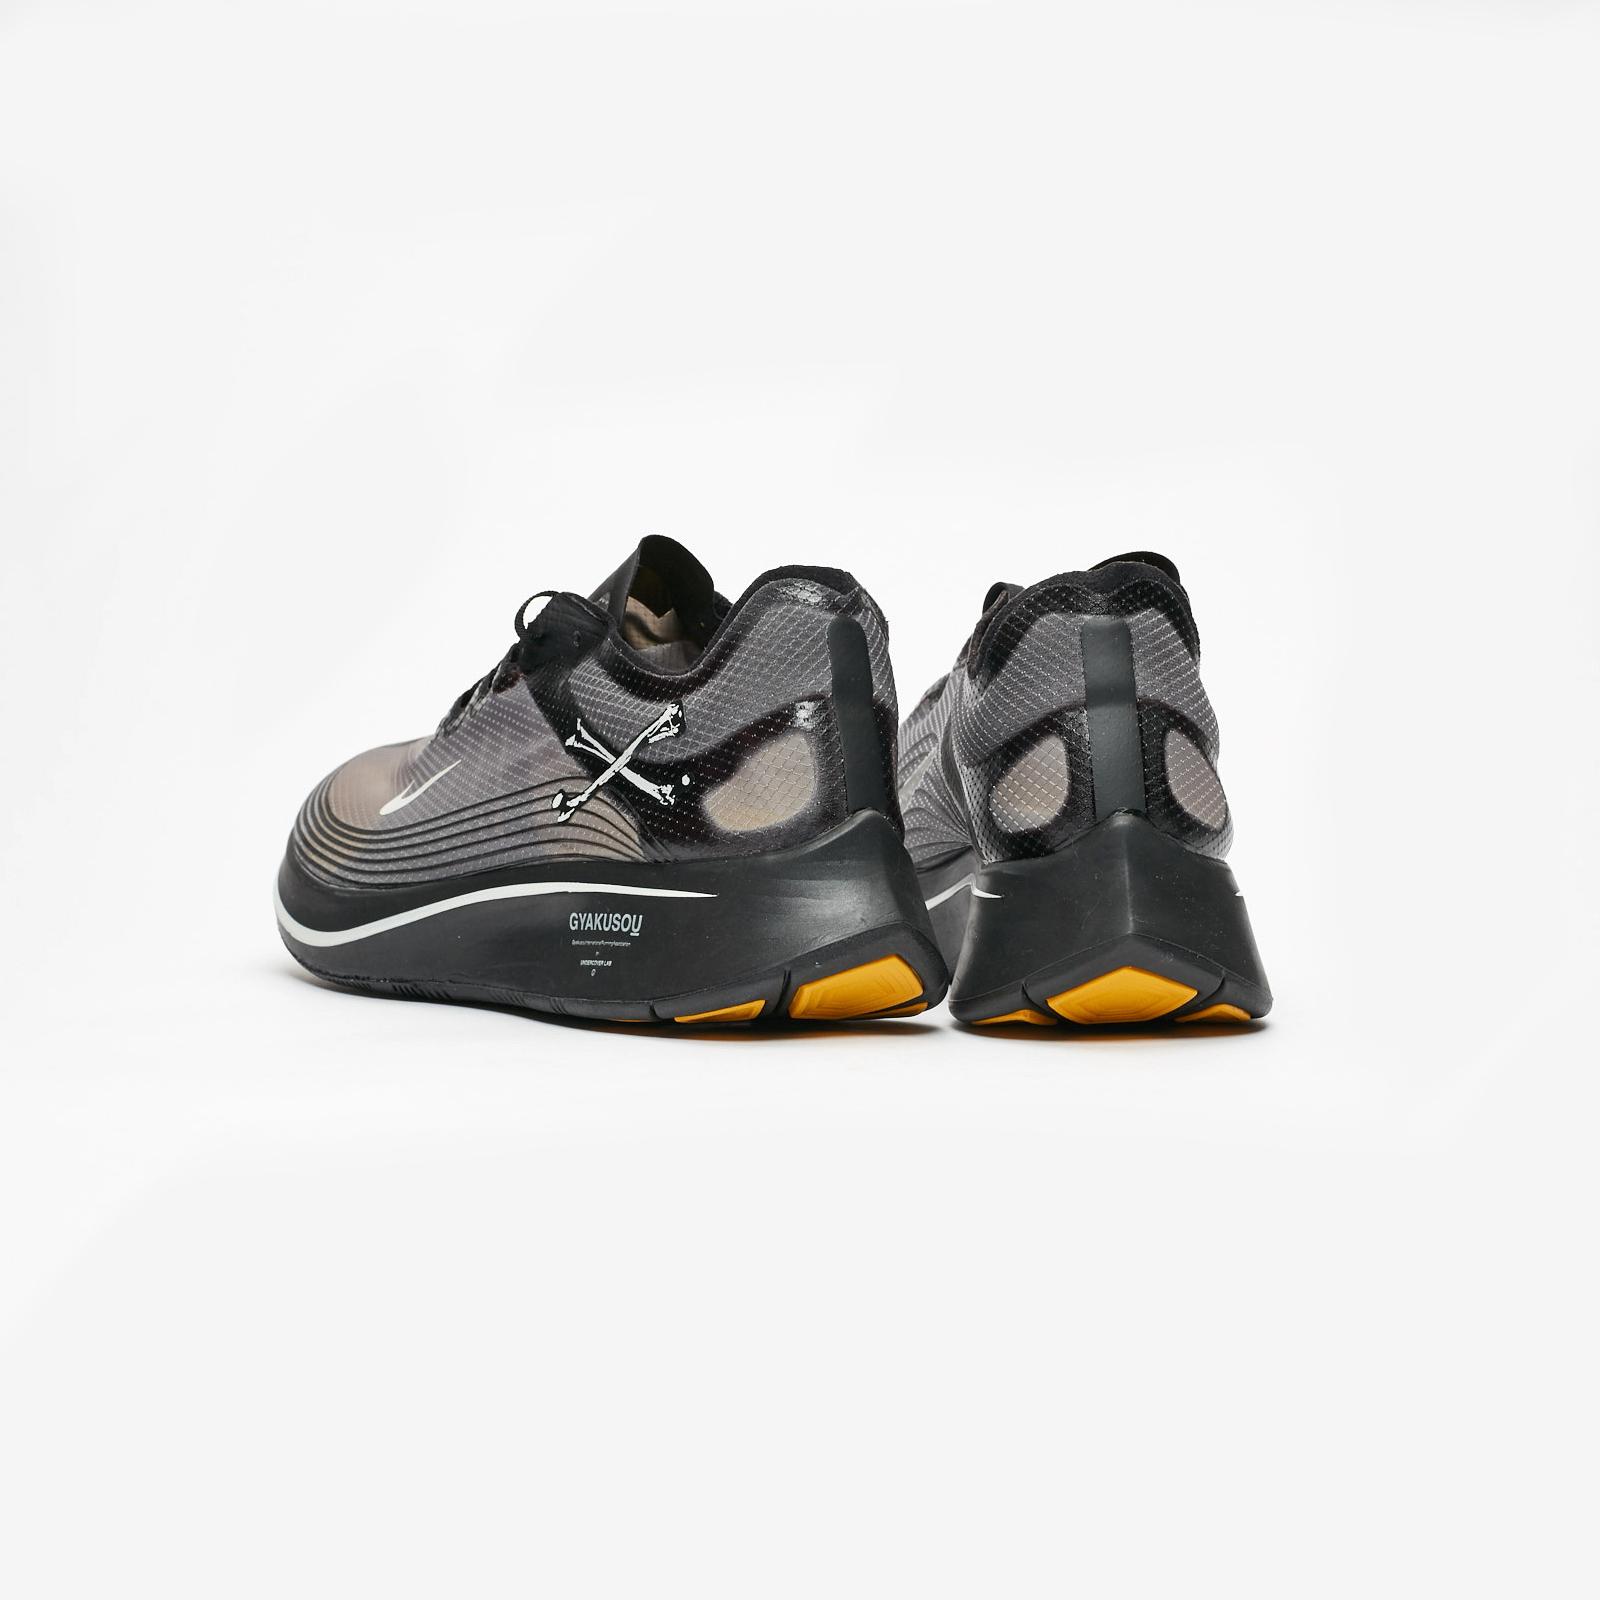 newest collection 4e8e4 cbe9f Nike Zoom Fly   Gyakusou - Ar4349-001 - Sneakersnstuff   sneakers    streetwear online since 1999